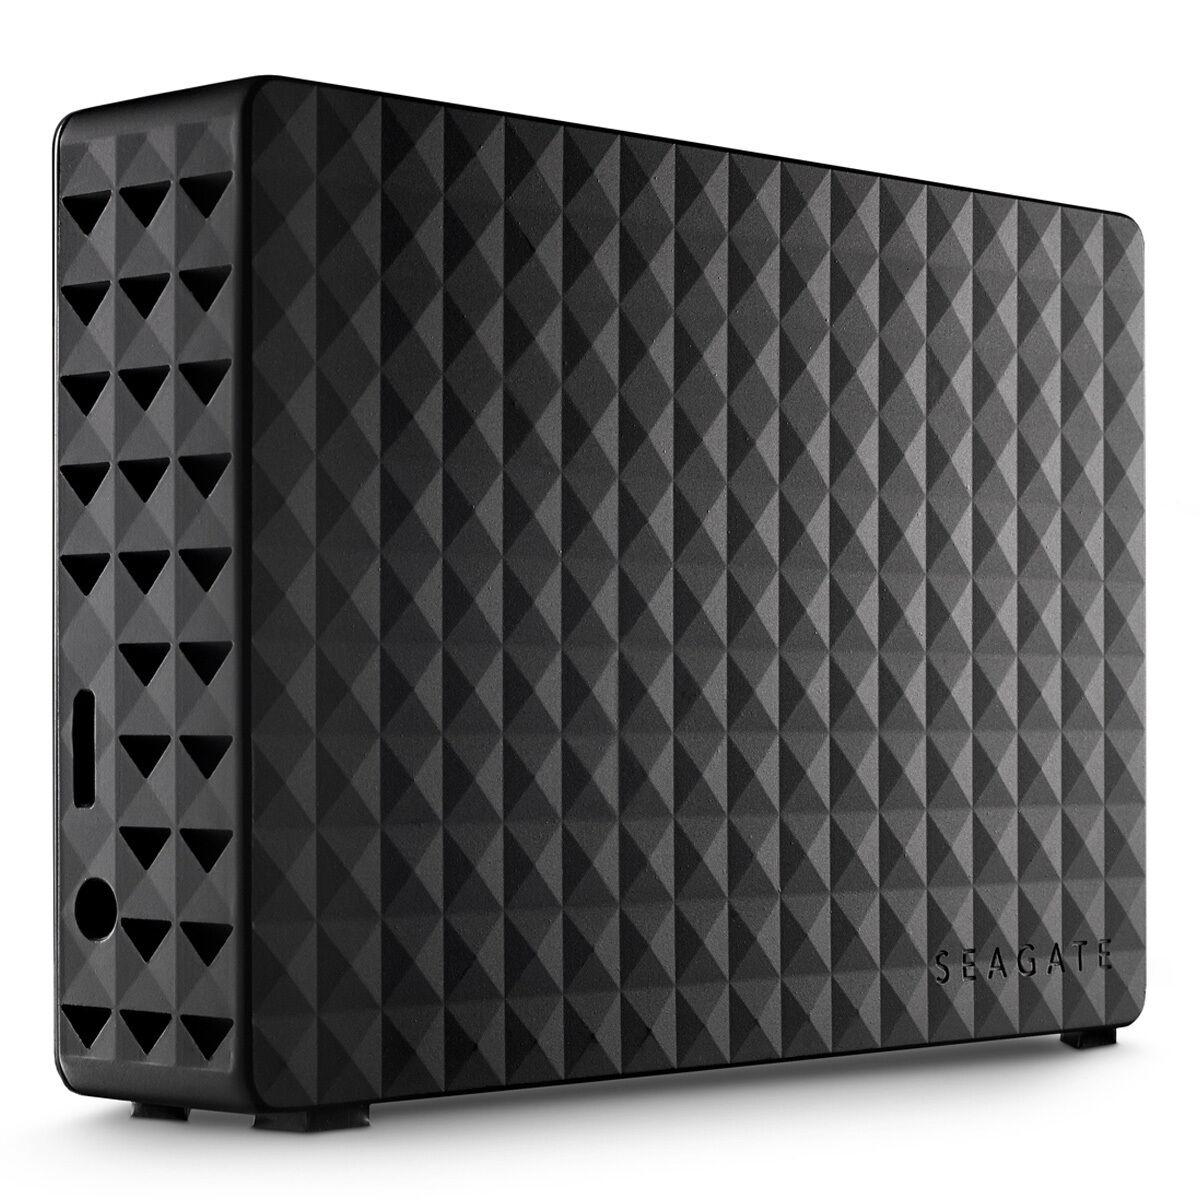 Seagate Expansion Desktop 12TB Schwarz - externe Festplatte, USB 3.0